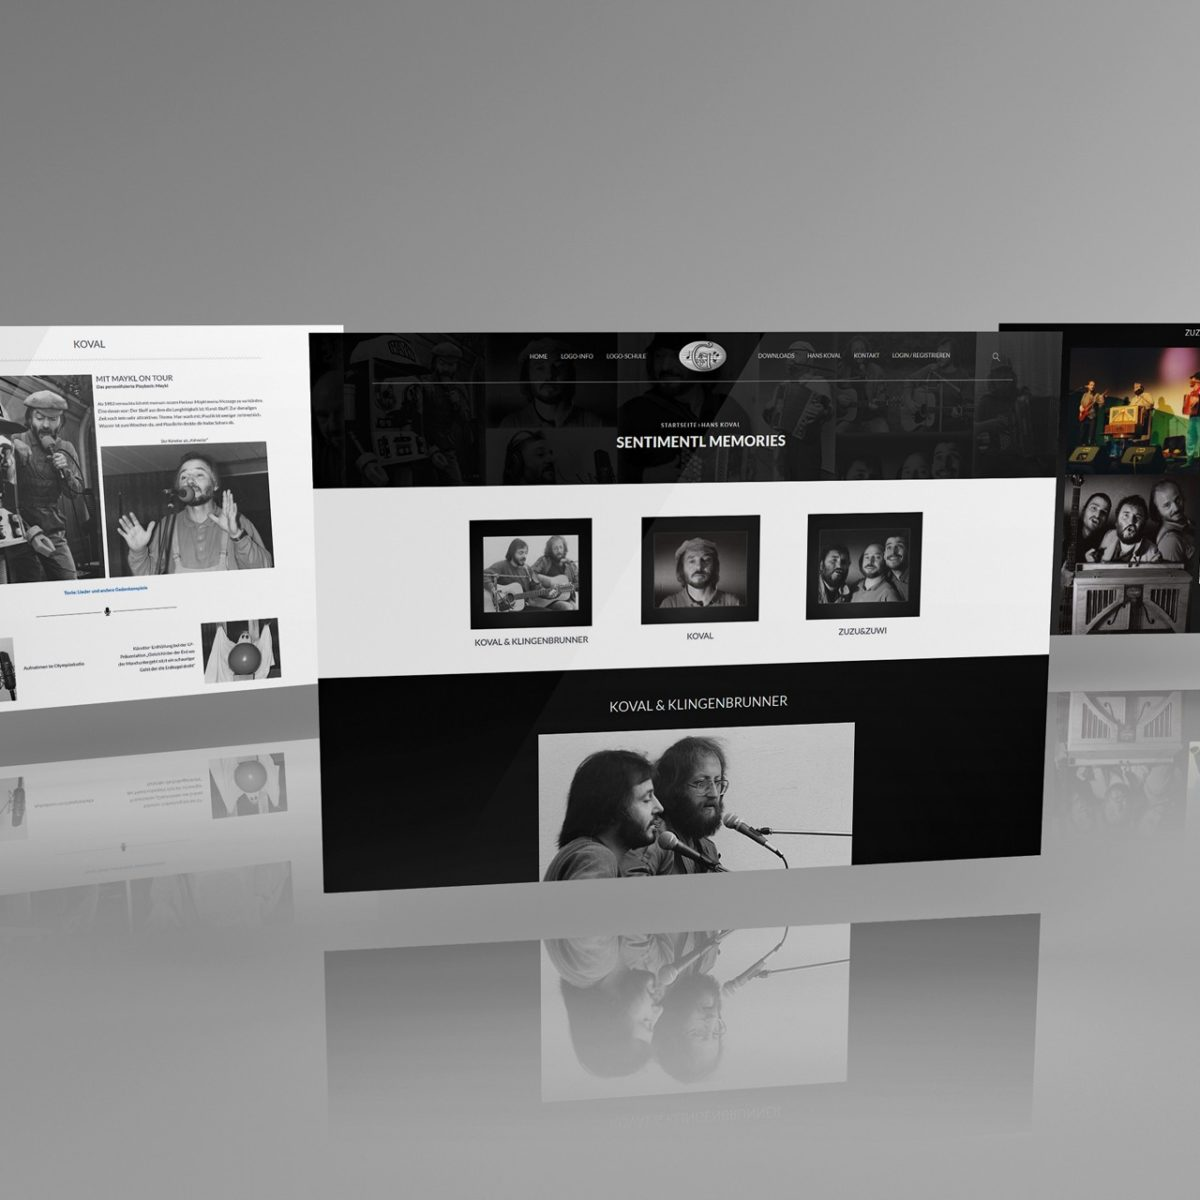 Webdesign Beispielprojekt Hans Koval